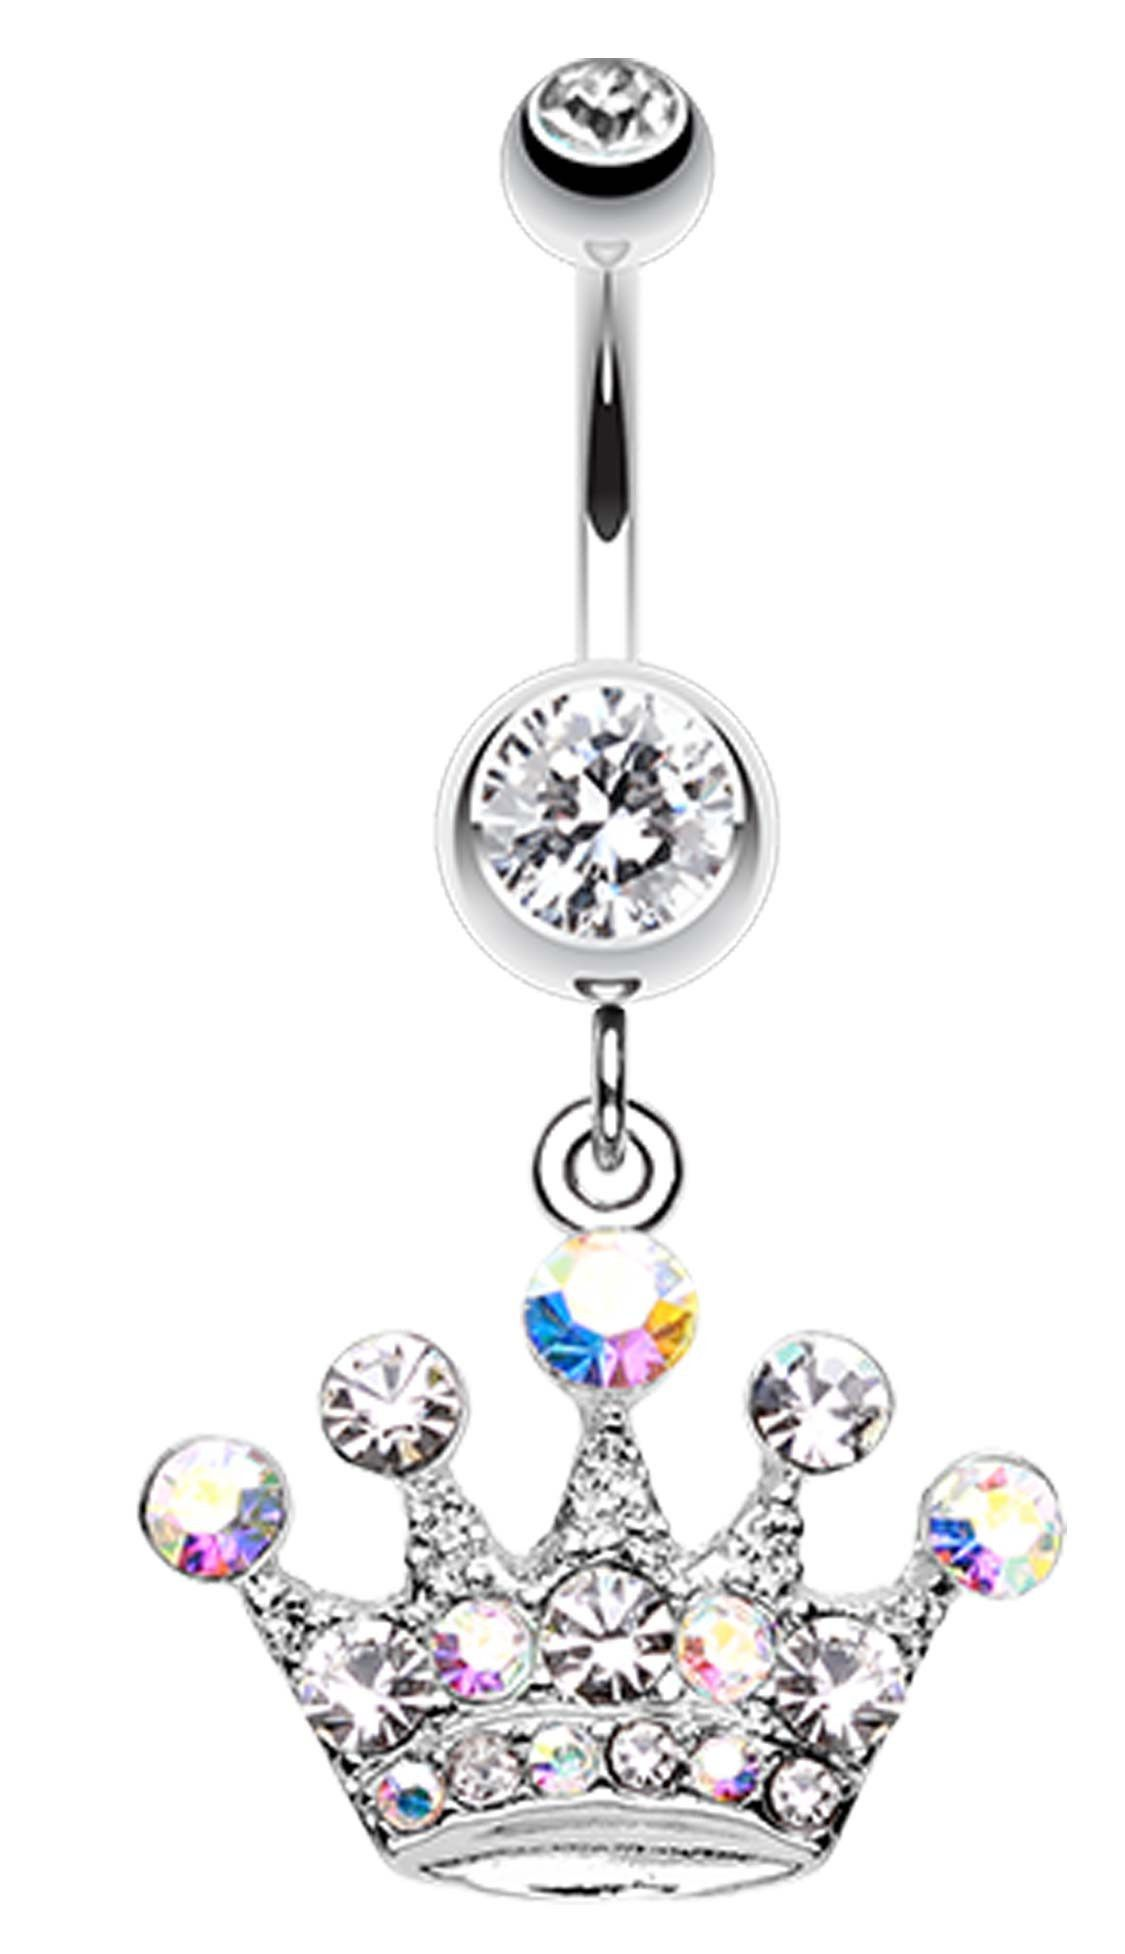 Nose piercing earrings  Crown Jewel MultiGlassGem Belly Button Ring  Crown jewels Belly